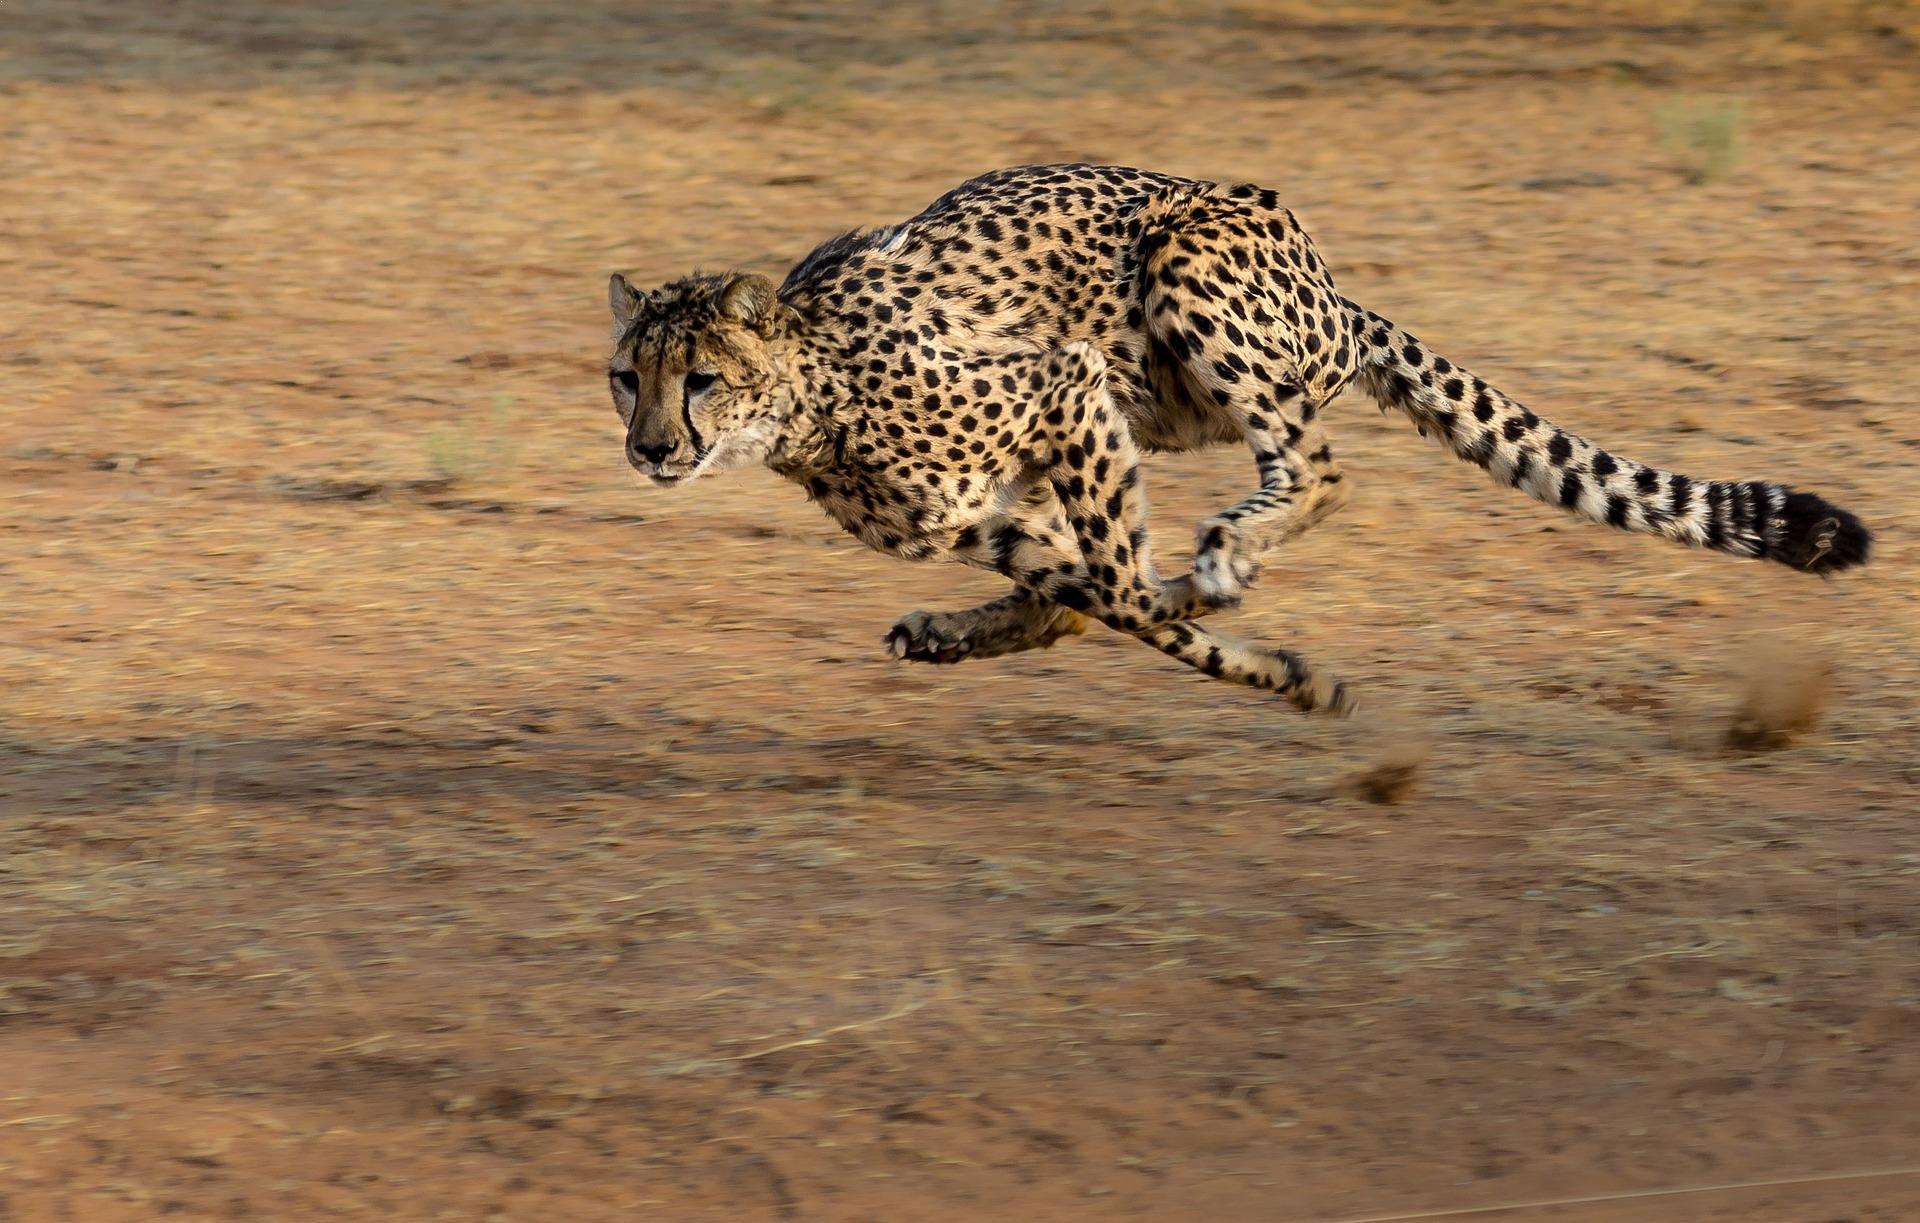 Fastest Land Animals In The World